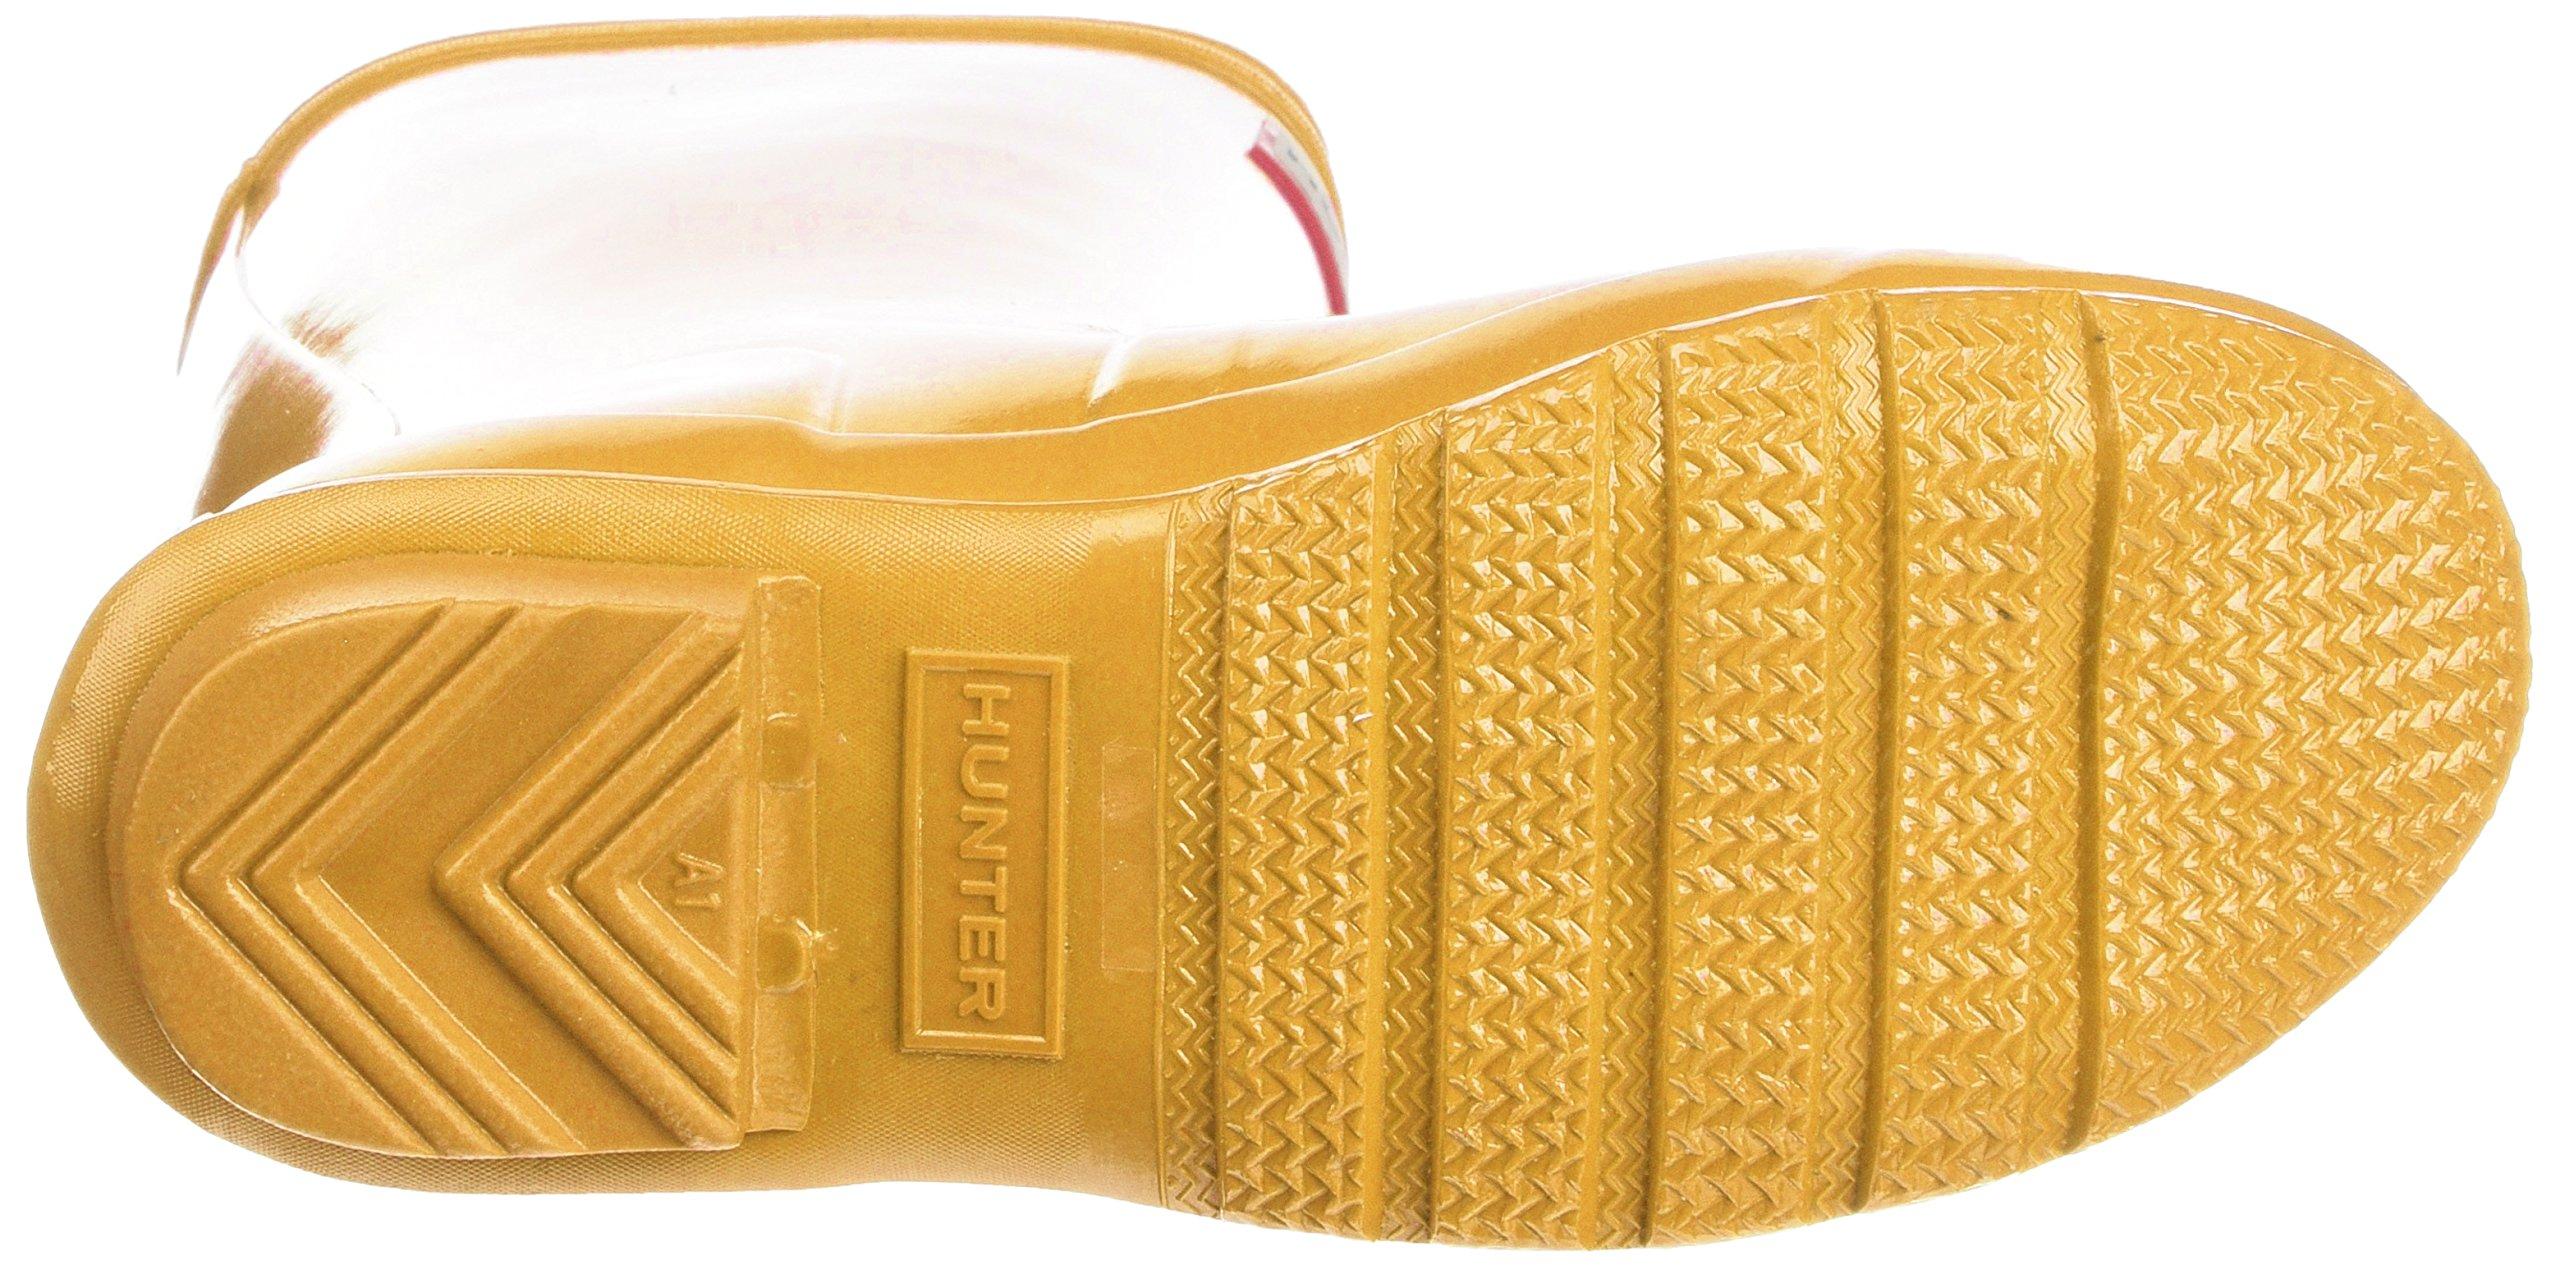 Hunter Kids' Original Gloss Boot, 34, Yellow by Hunter Kids (Image #3)